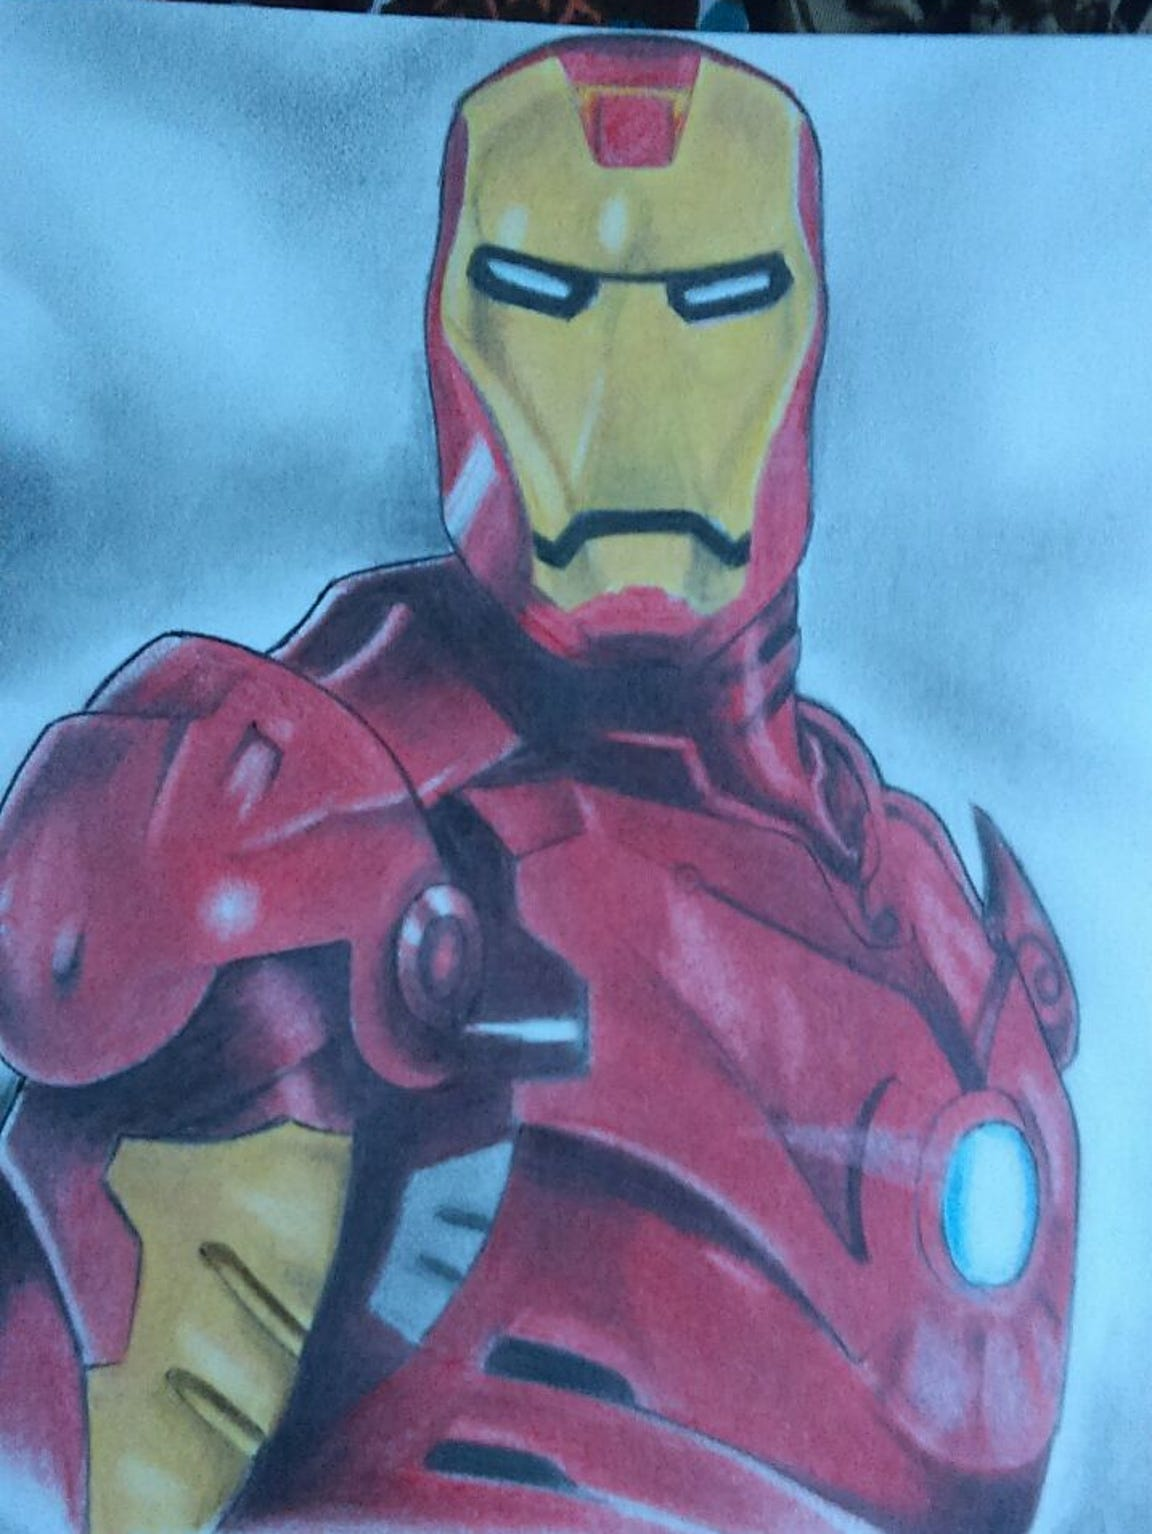 A pencil sketch drawn by Silvestre Segovia while in